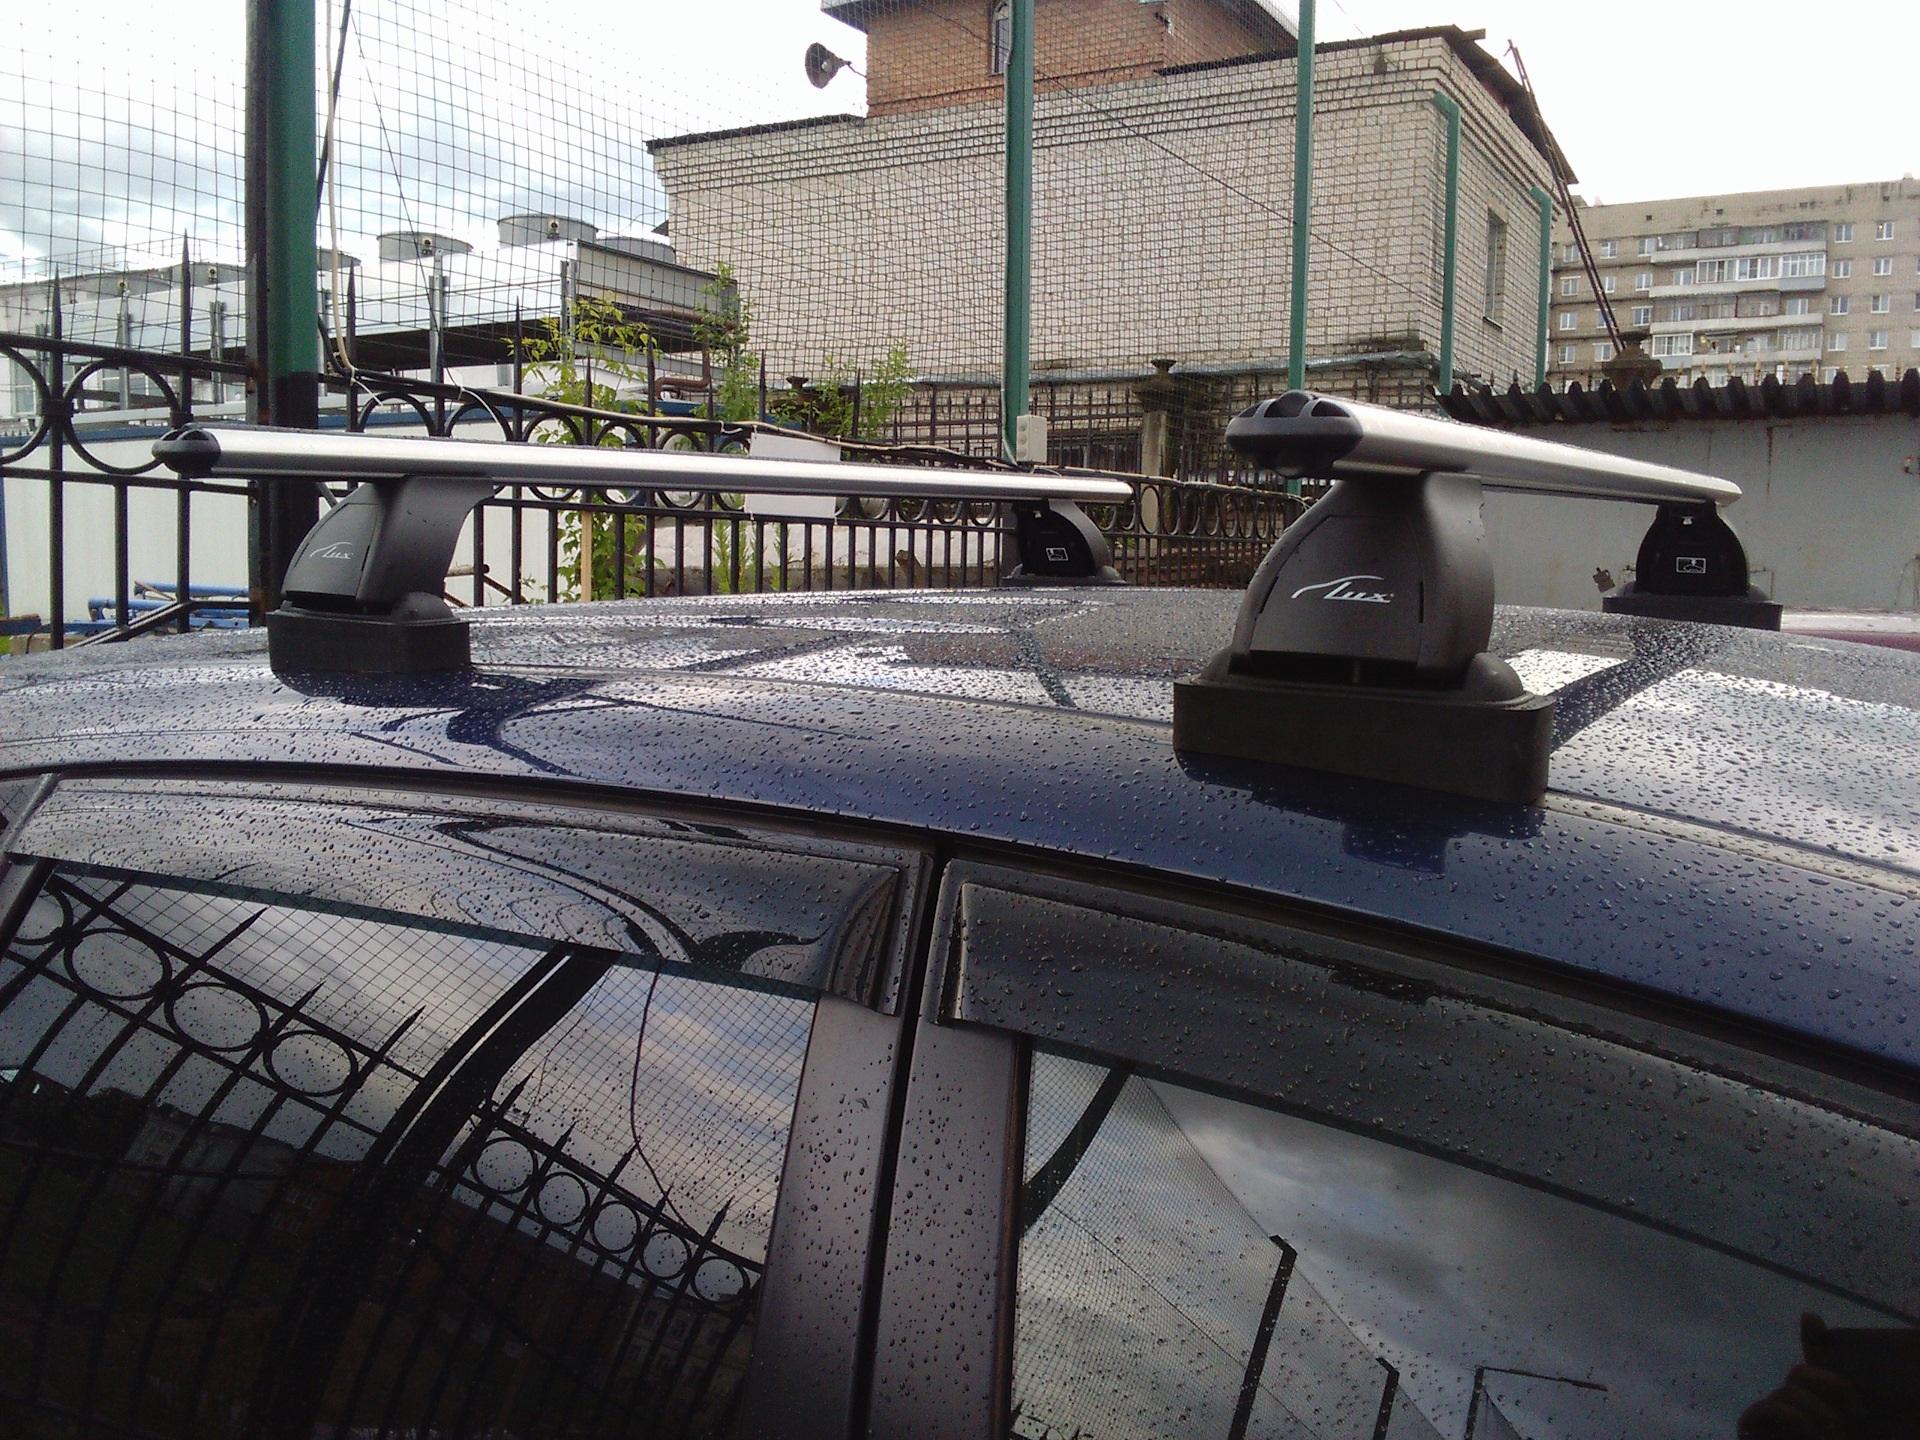 Багажник Lux «Трэвел» 82 на крышу Suzuki Liana универсал